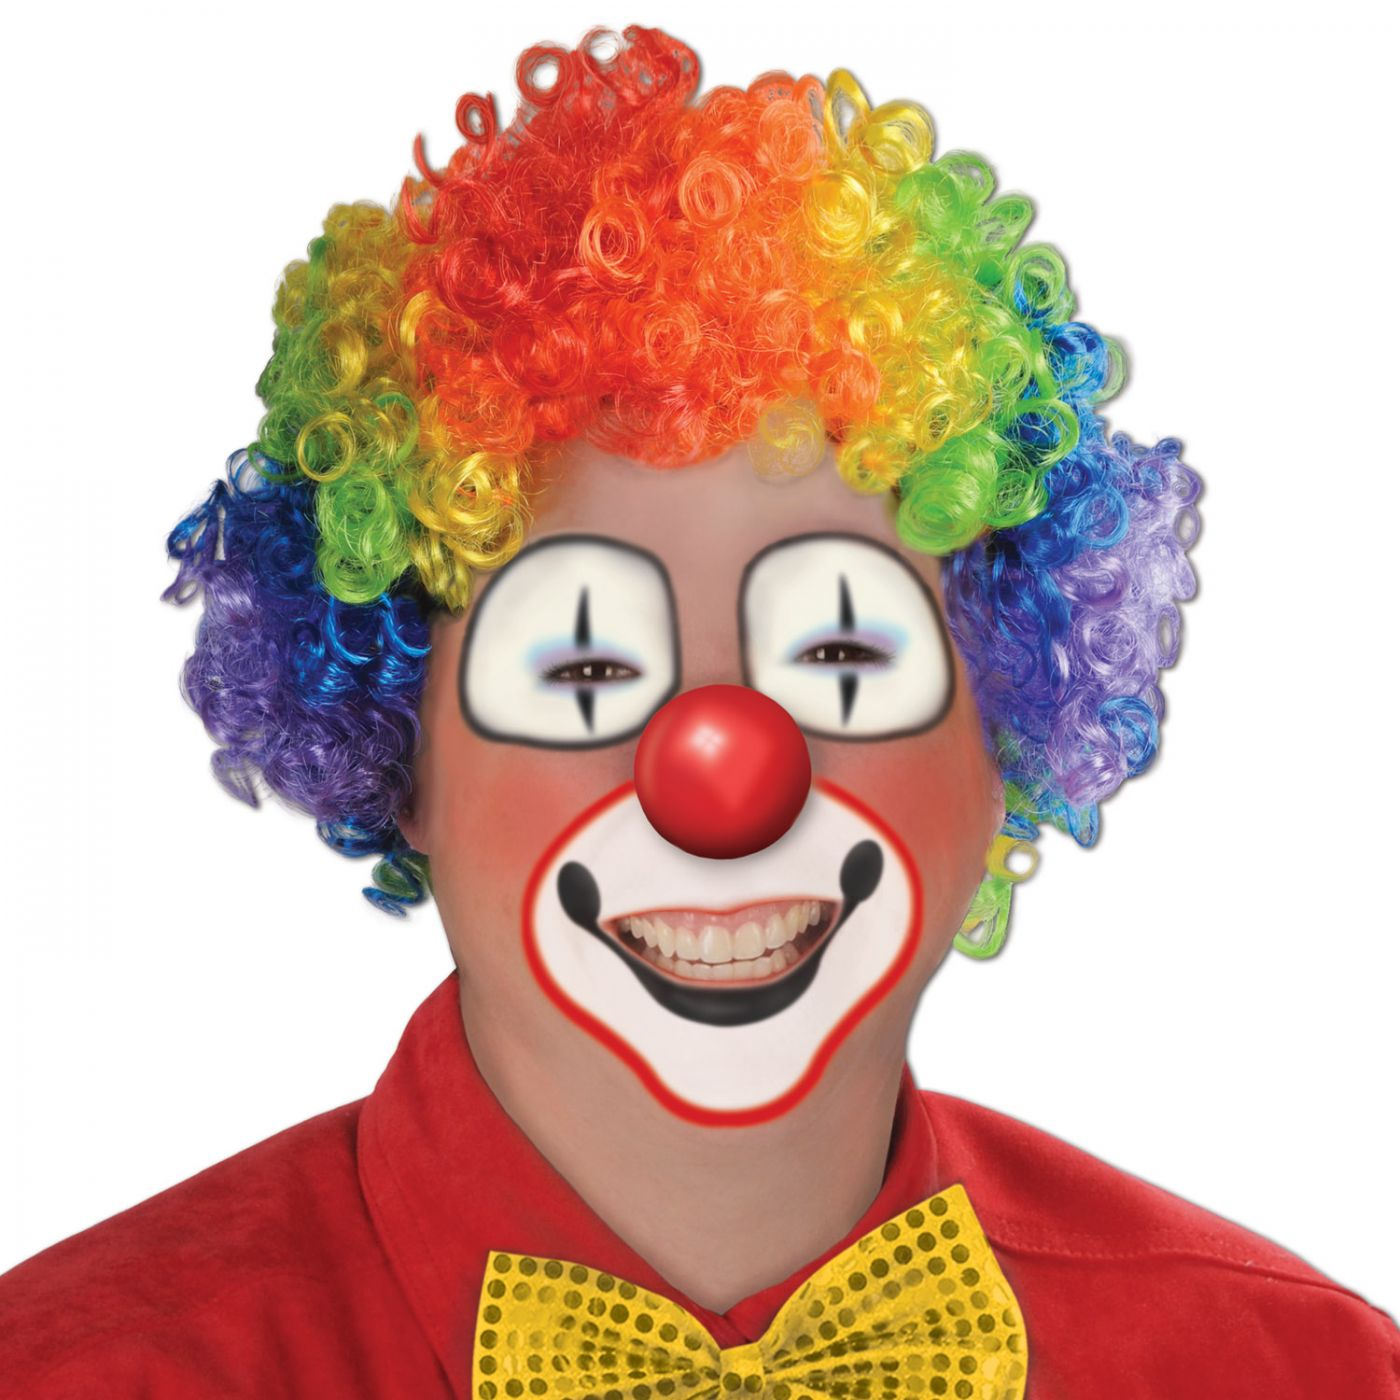 Rainbow Clown Wig image